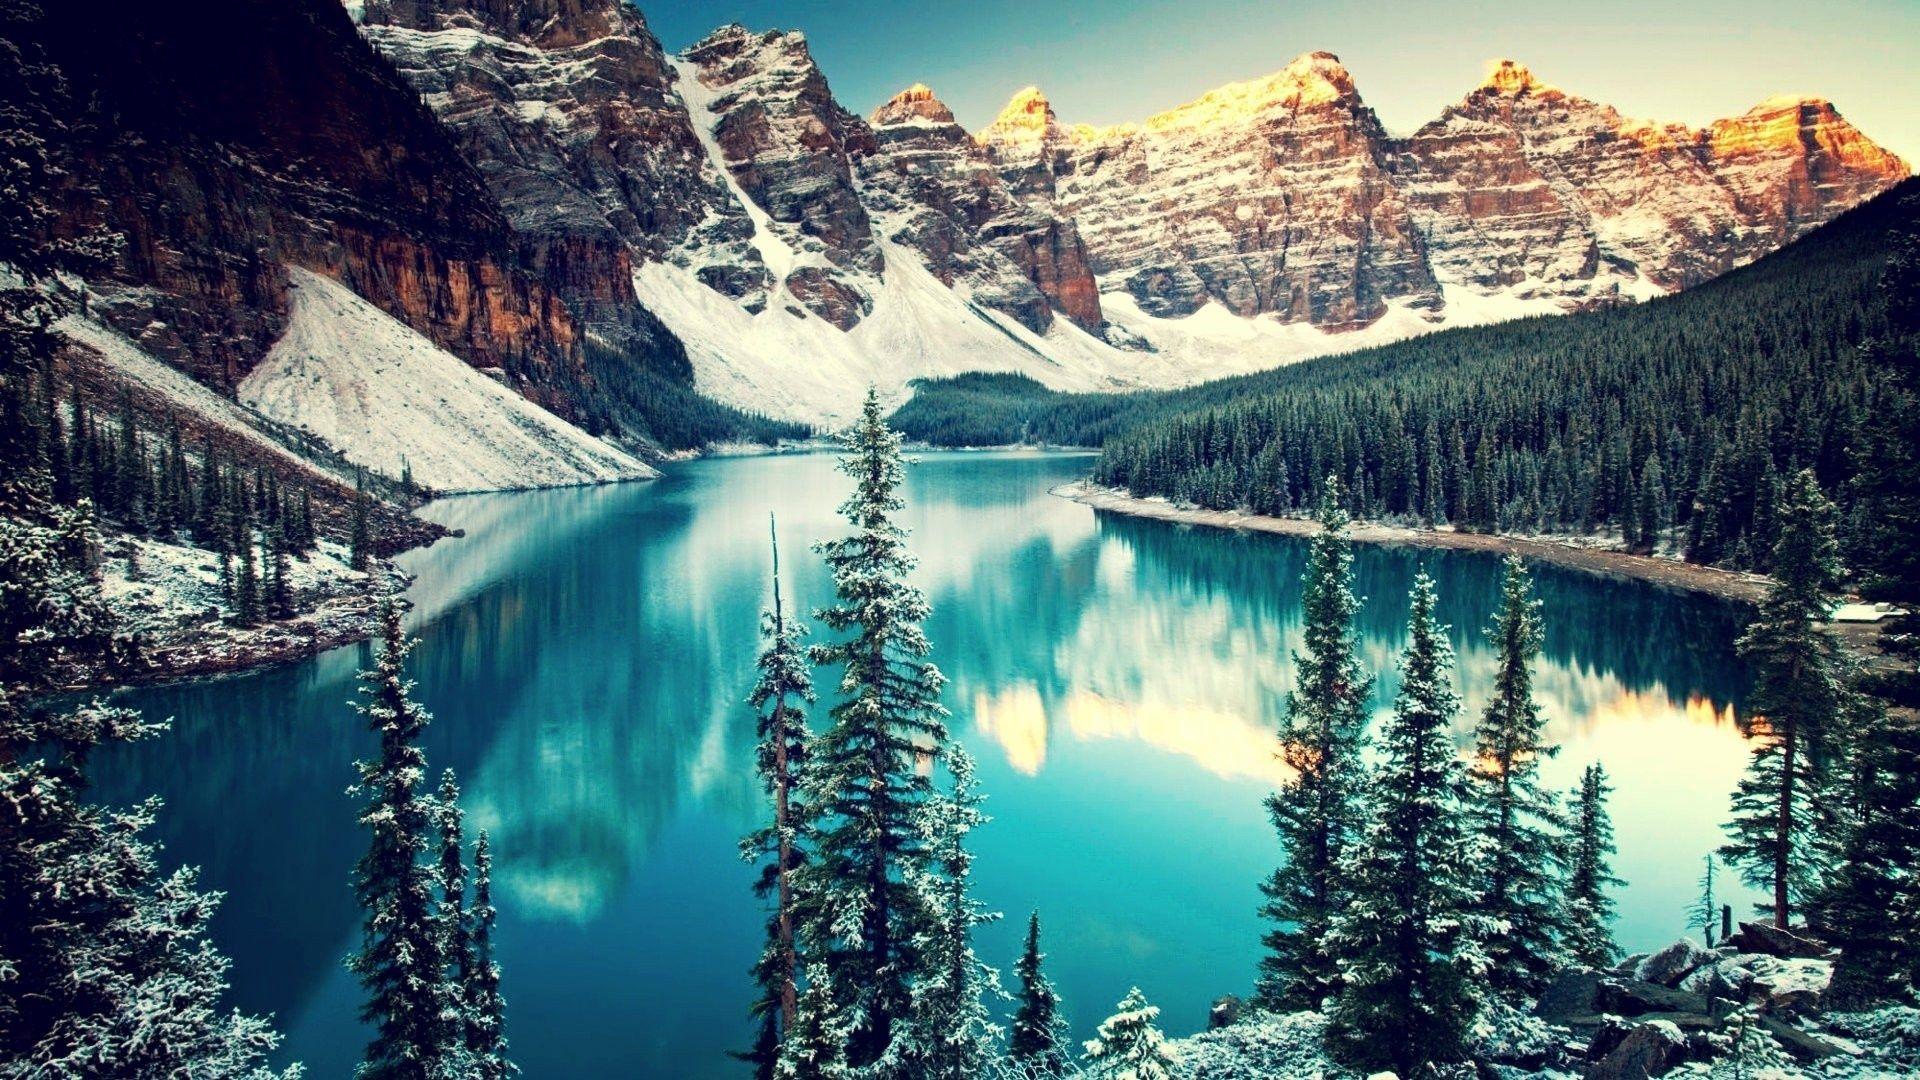 Nature Photo Hd wallpaper download